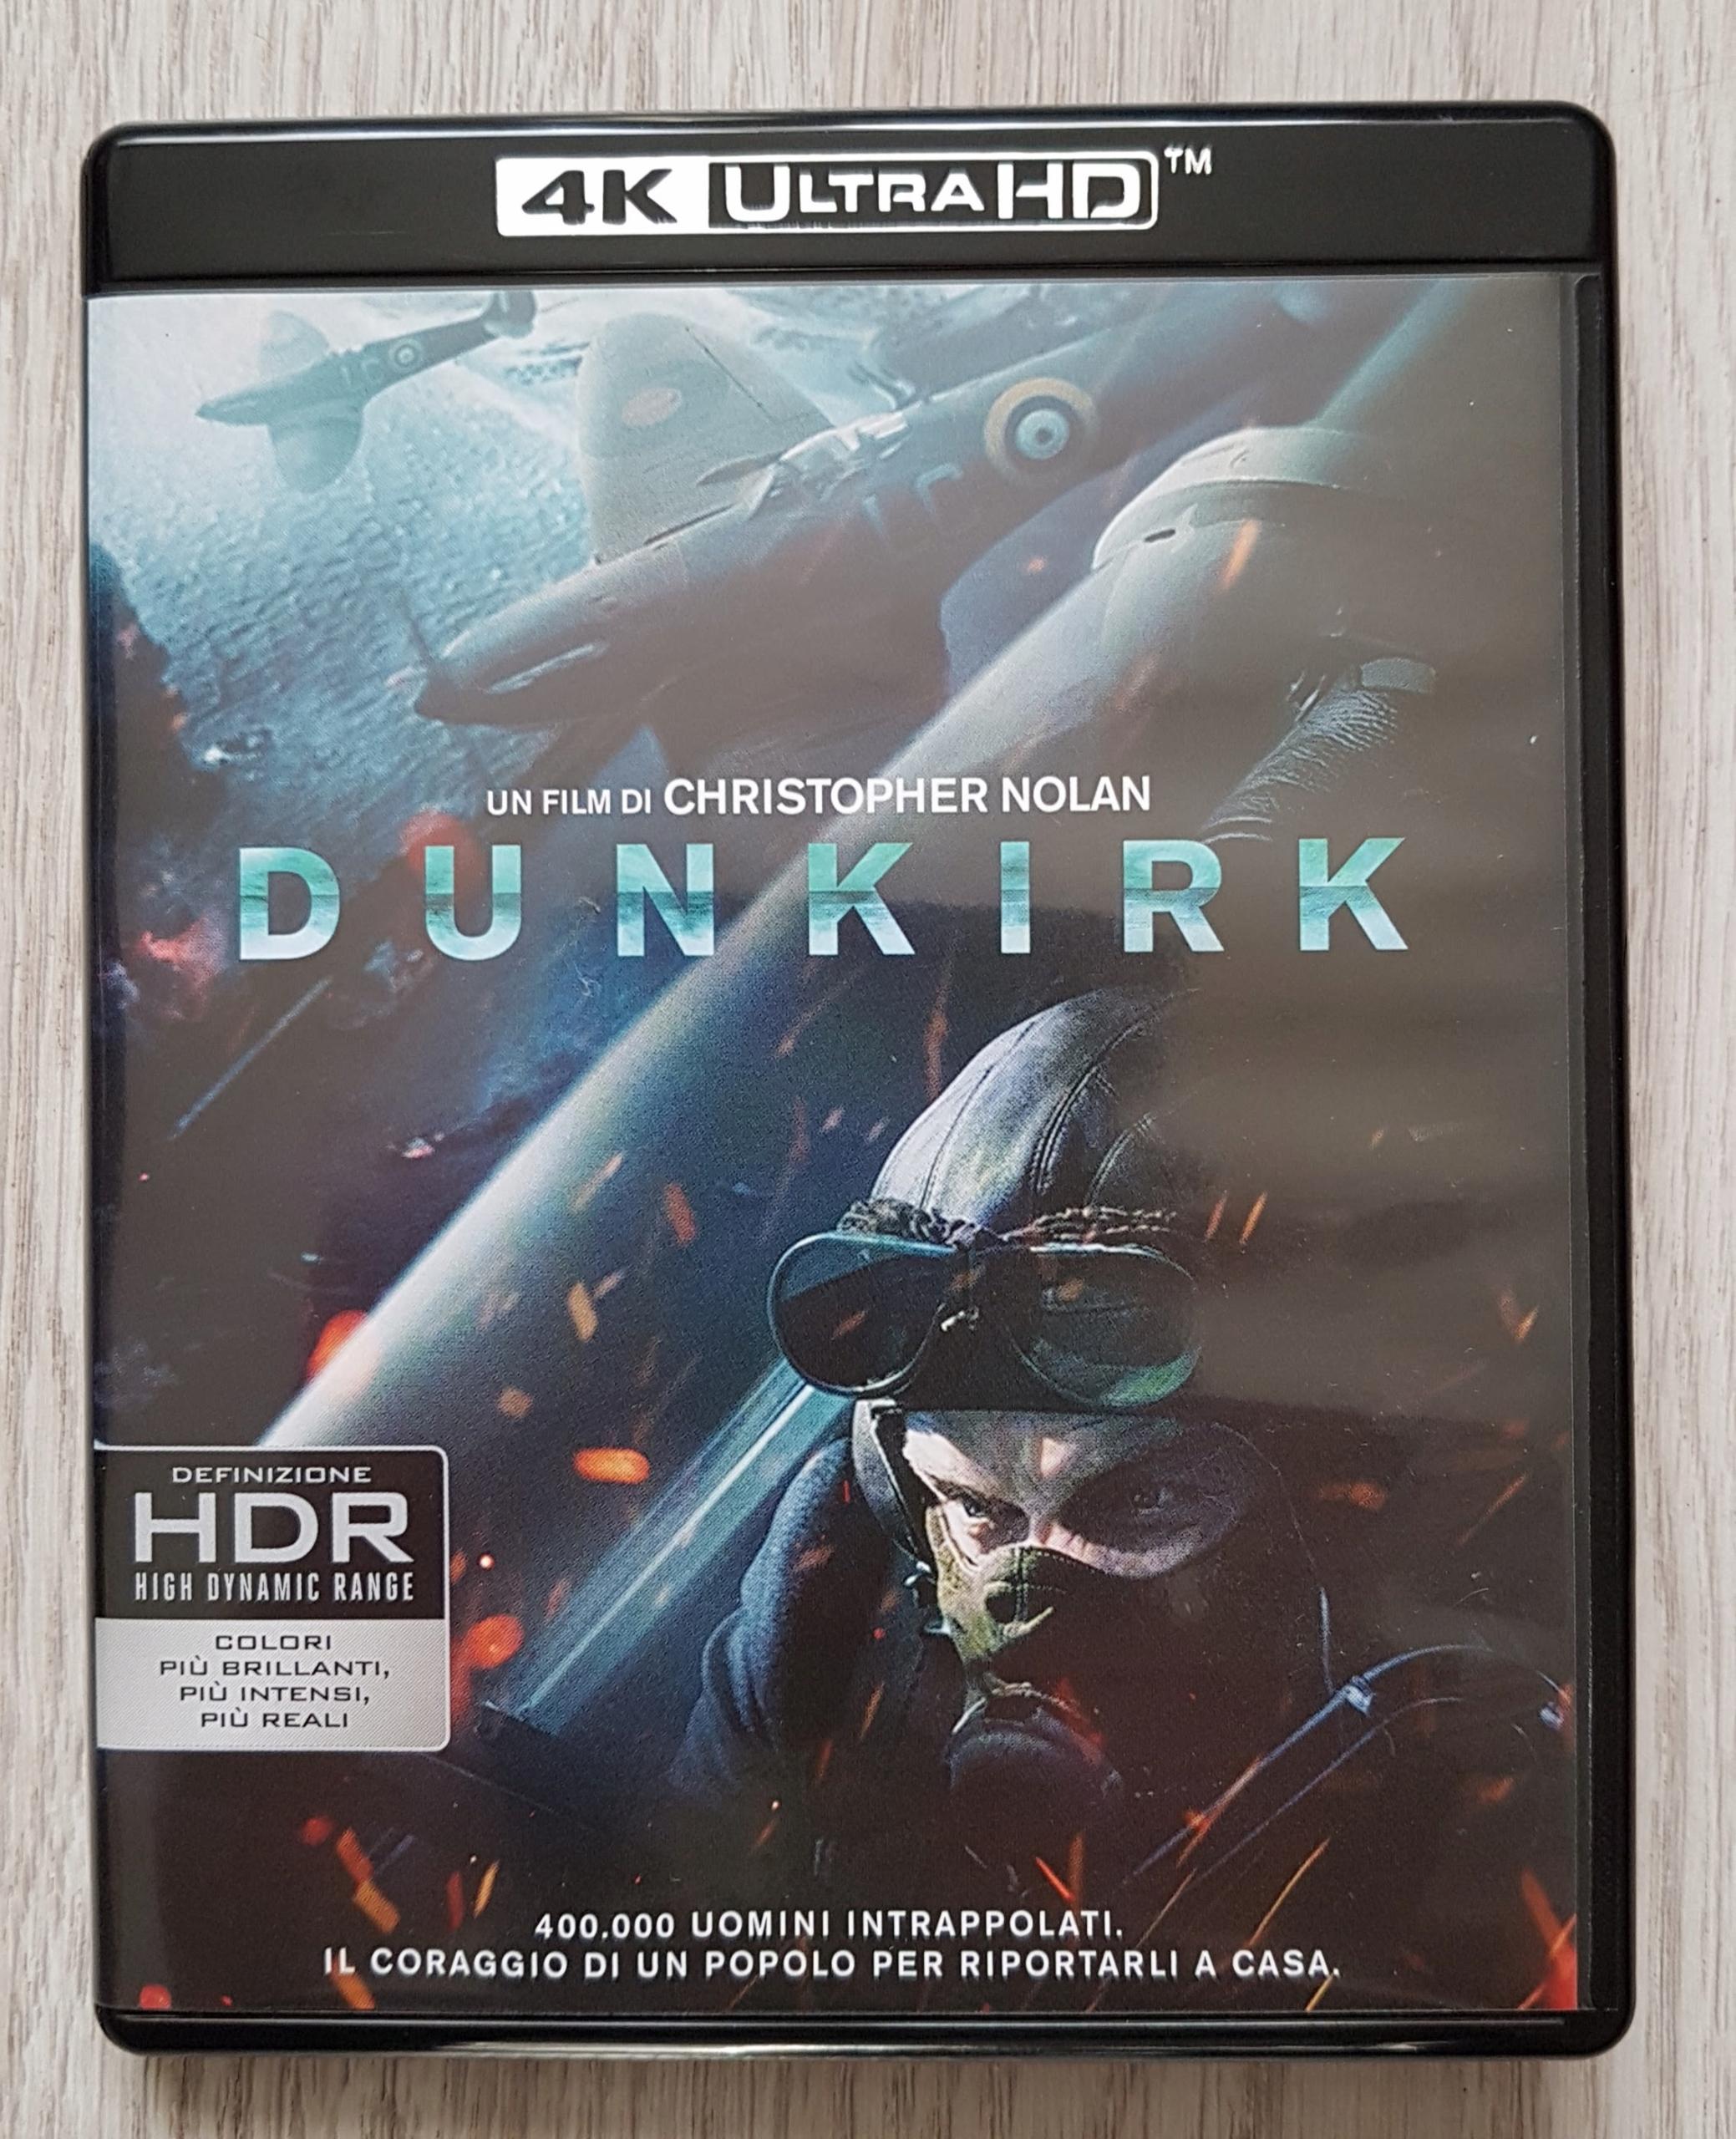 DUNKIRK [4K Ultra HD + 2 Blu-ray] DUNKIERKA PL